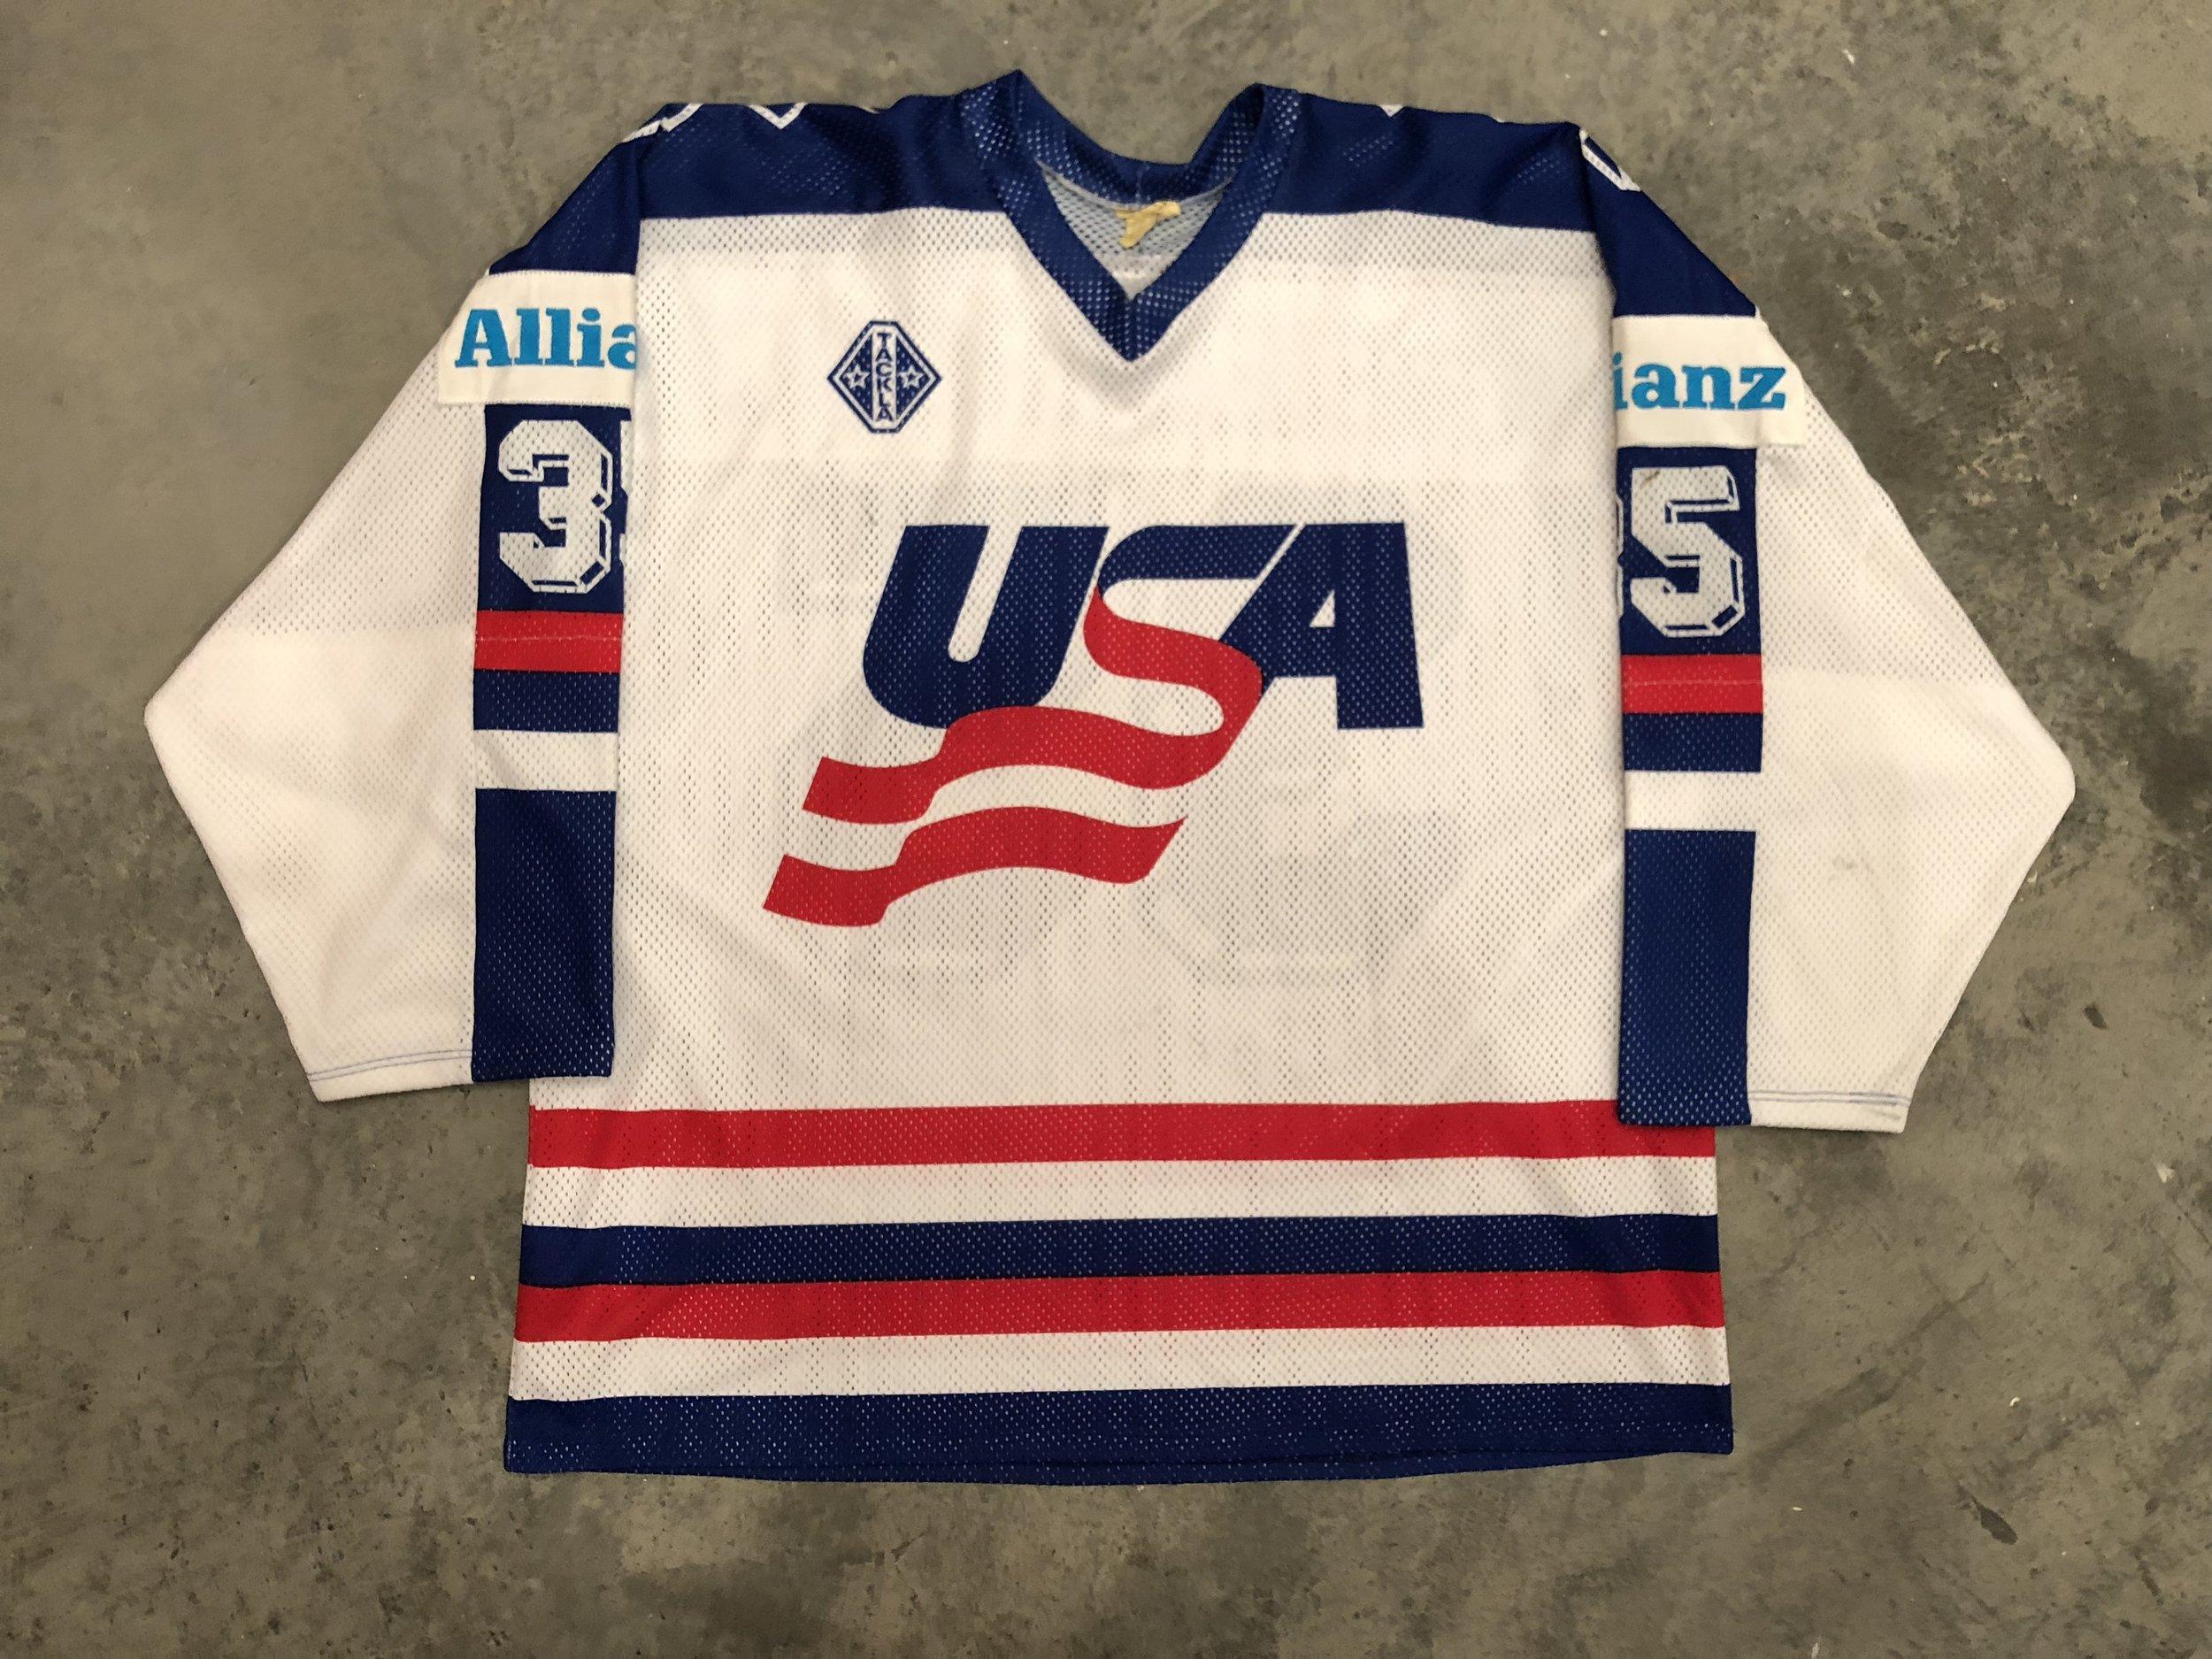 1991 World Championships John Vanbiesbrouck Team USA Game Worn Jersey